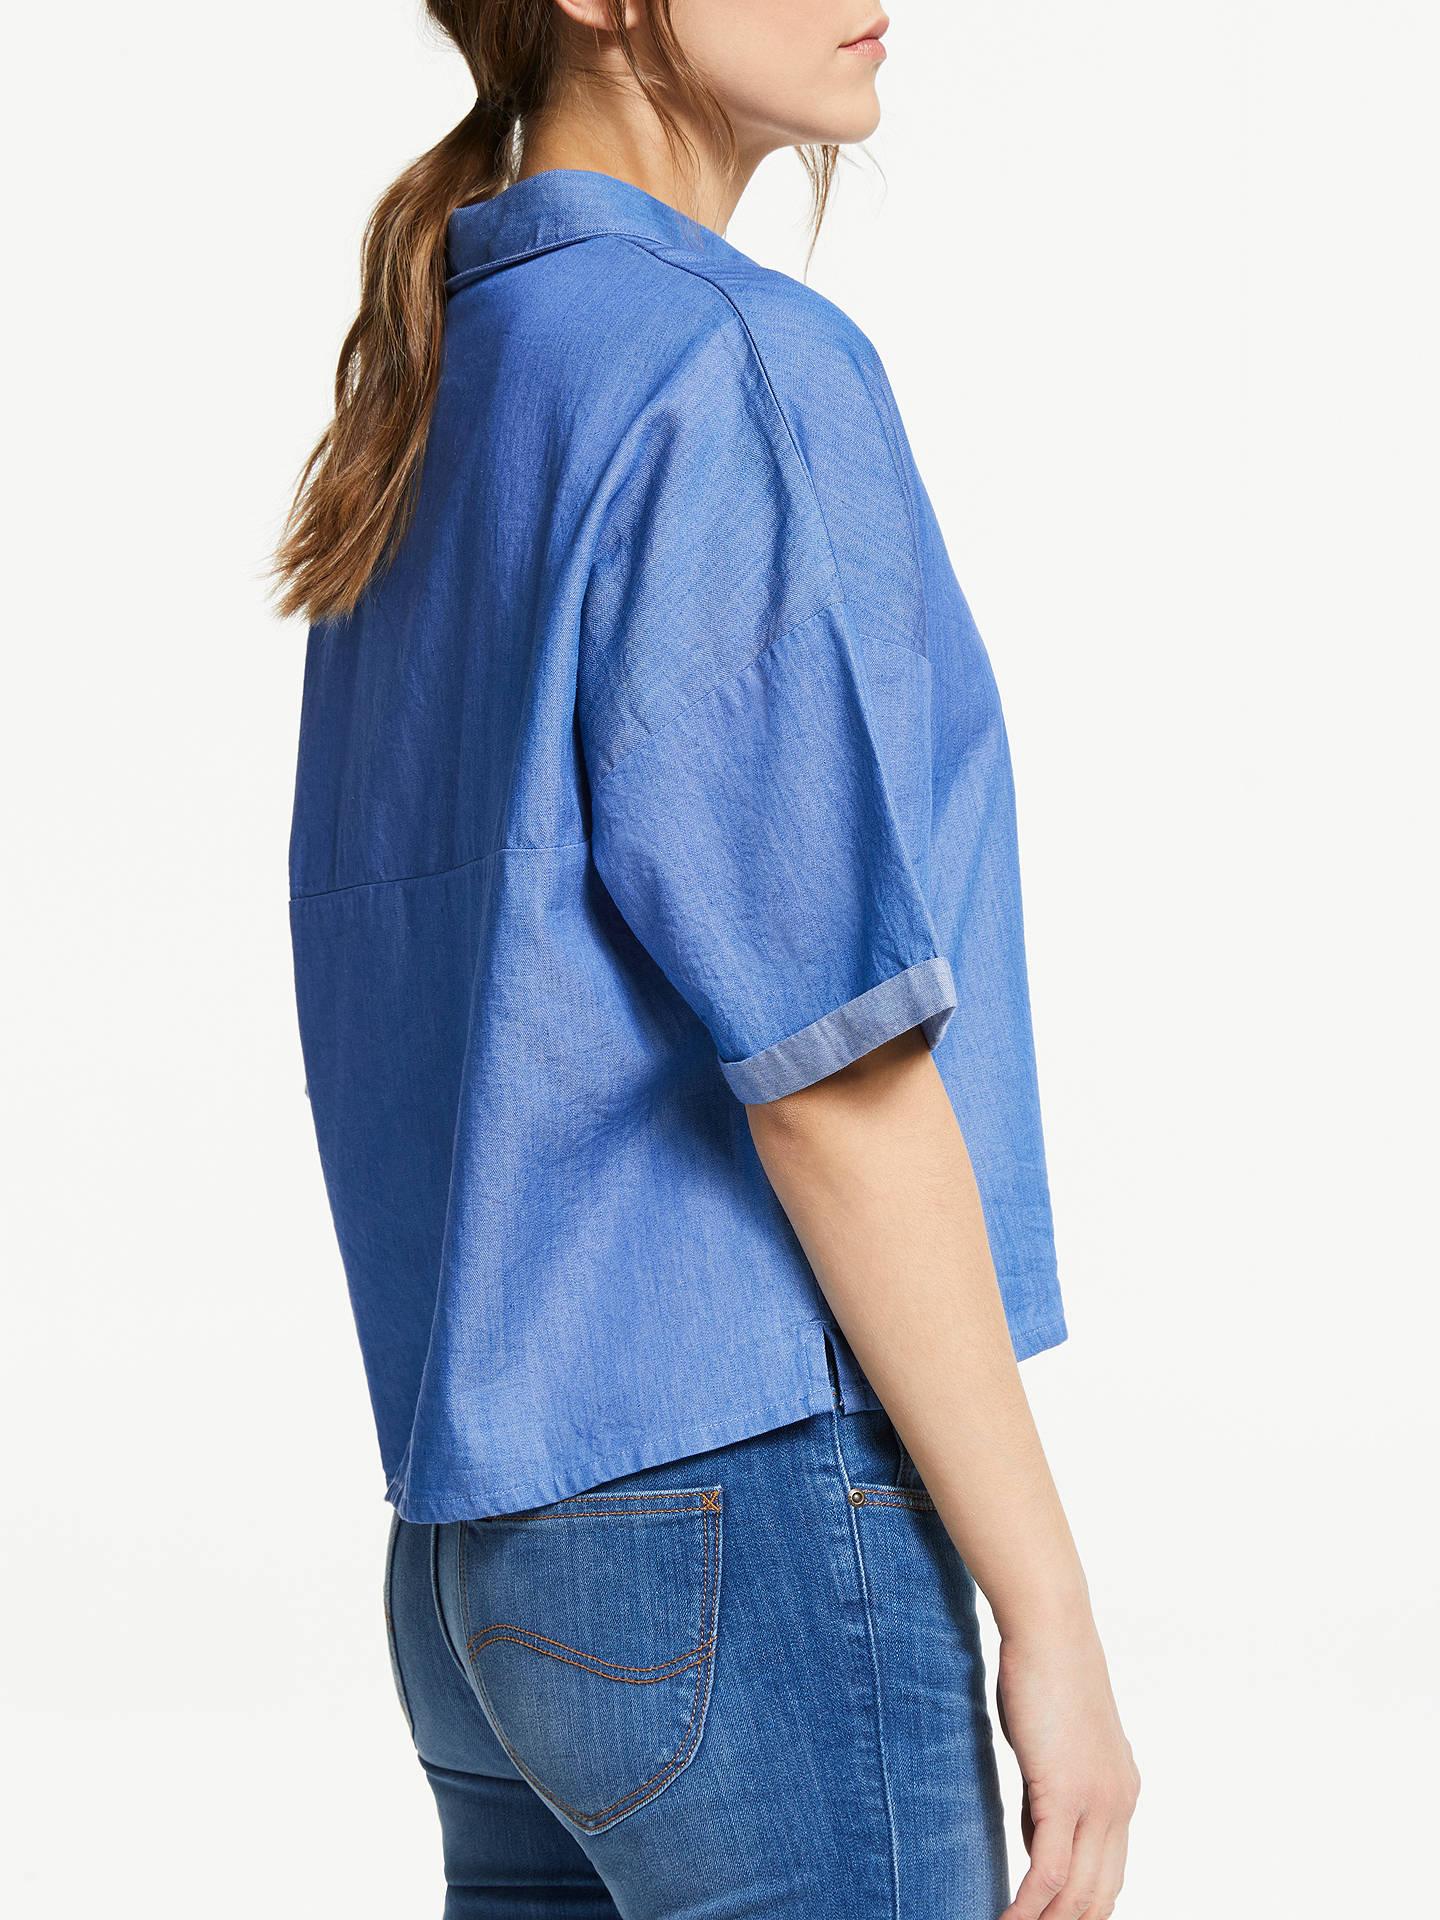 4fd1e89a9134de ... Buy Lee Cropped Denim Shirt, Dipped Blue, S Online at johnlewis.com